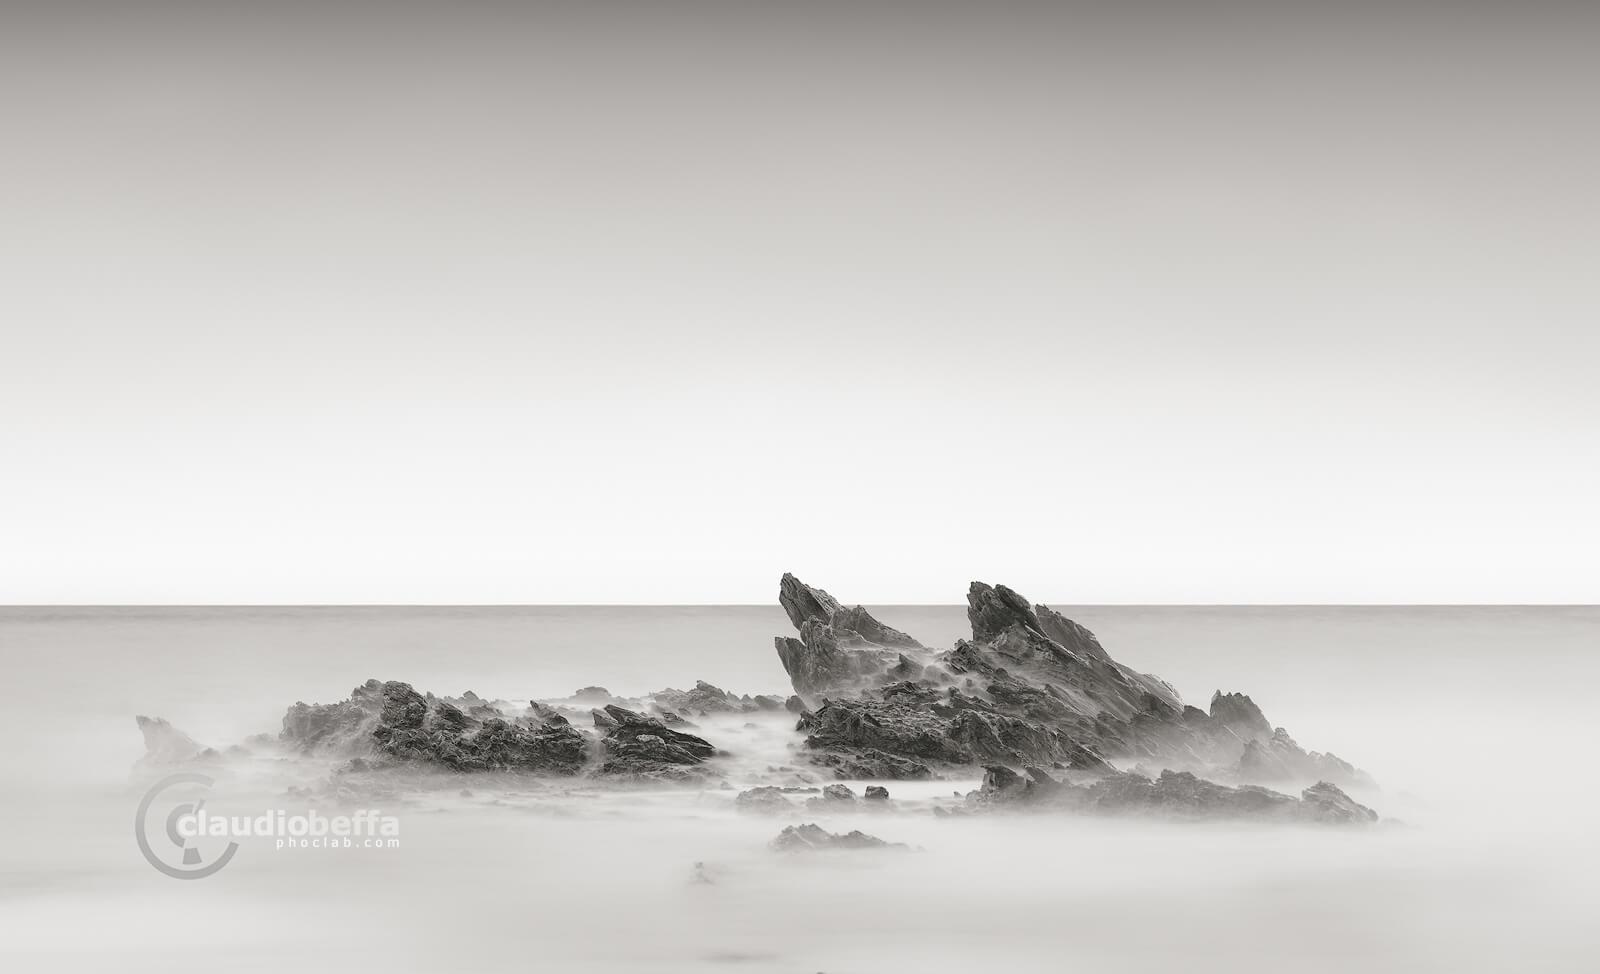 dragon scales, rocks, spikes, sea, waves, sardinia, italy, minimalist, minimal, long exposure, black and white, b&w